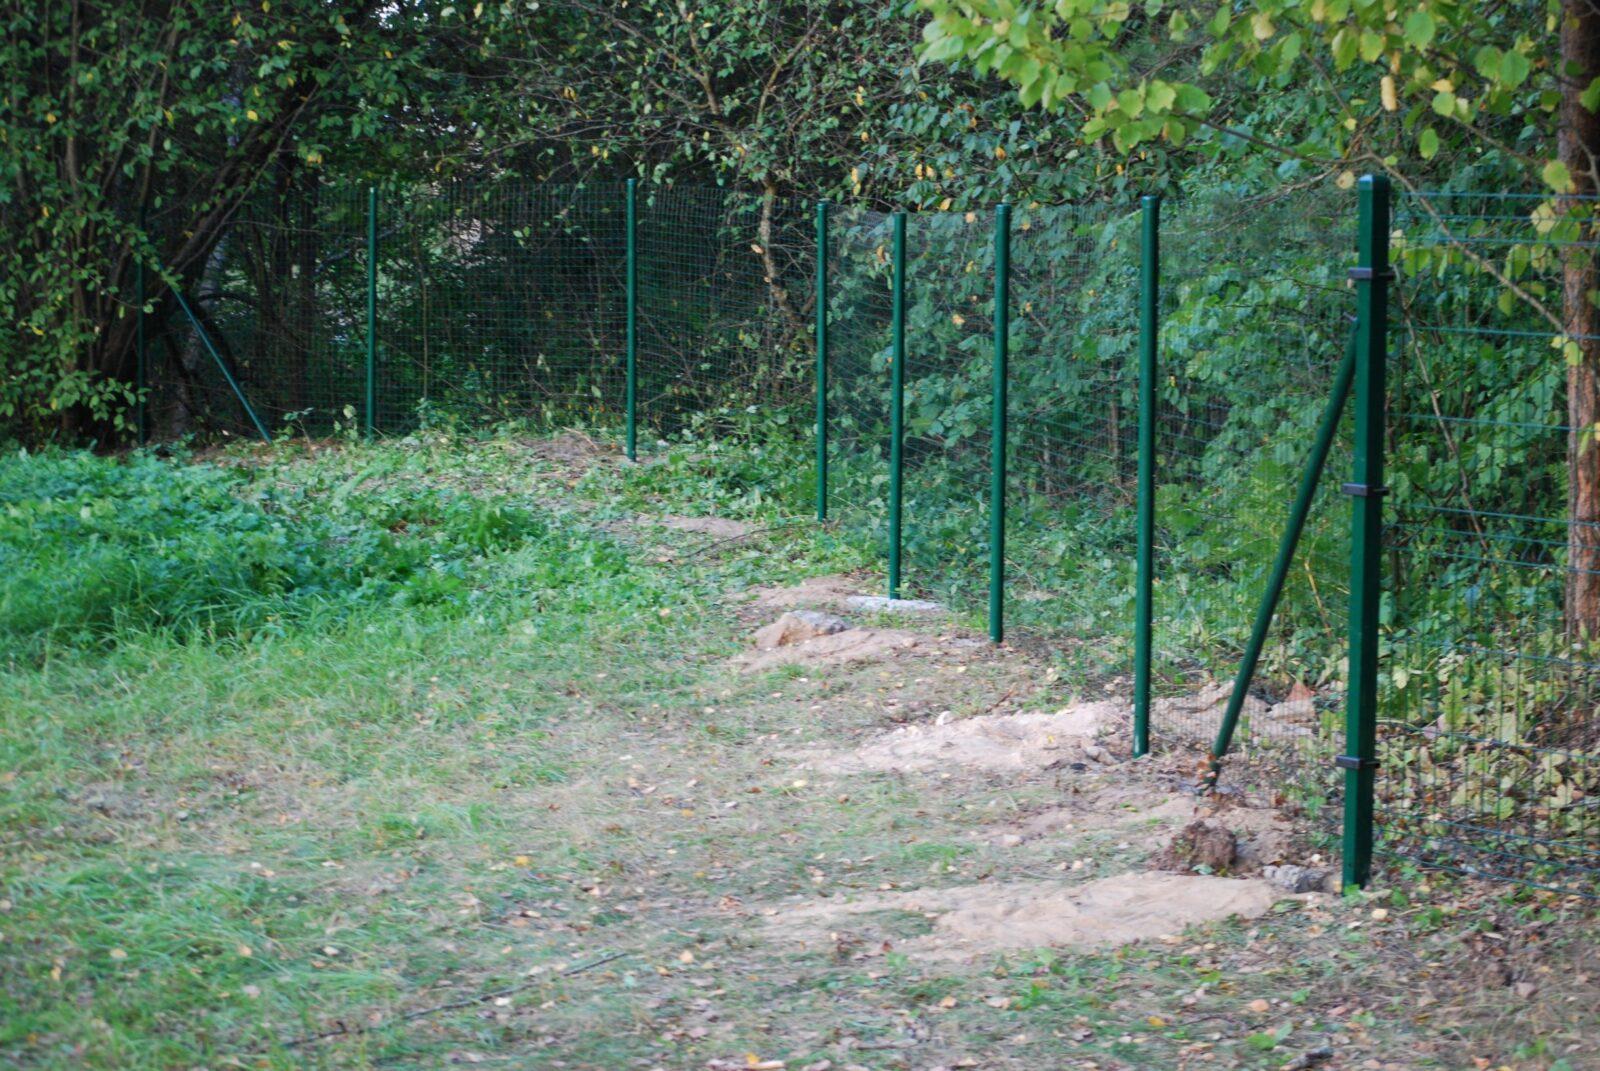 https://zogs.lv/wp-content/uploads/2016/10/Metinātie-ruļļu-žogi-11.jpg